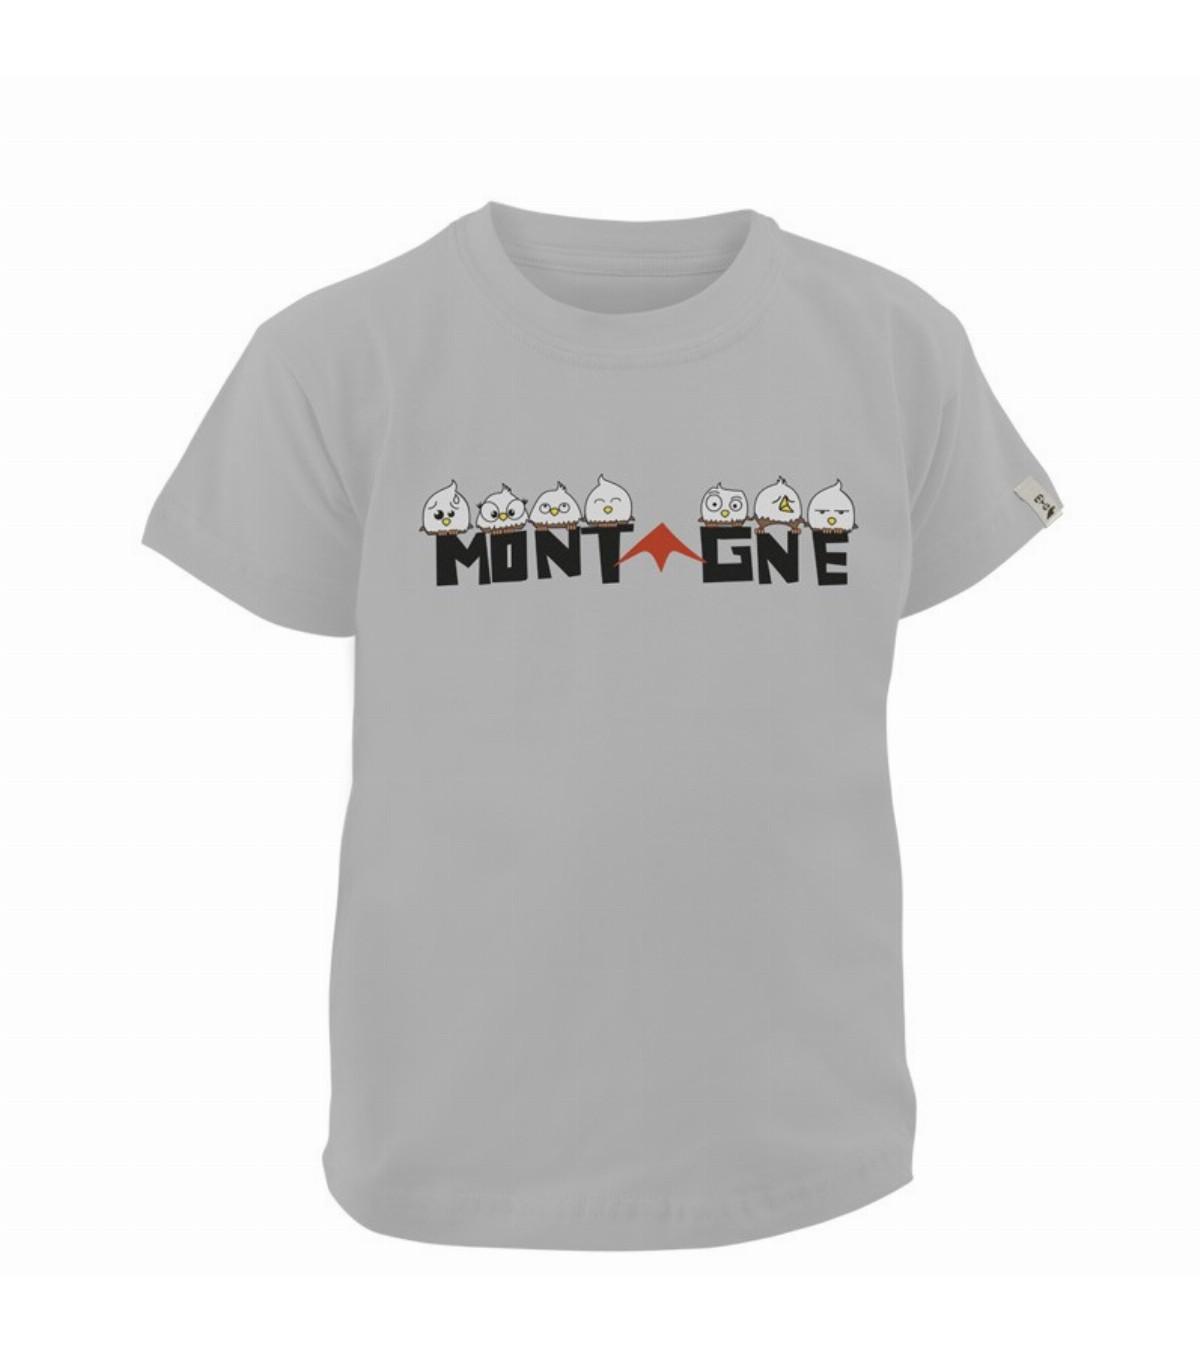 Remera de niños Monty - Remera de niños Monty b5329c72a73f4